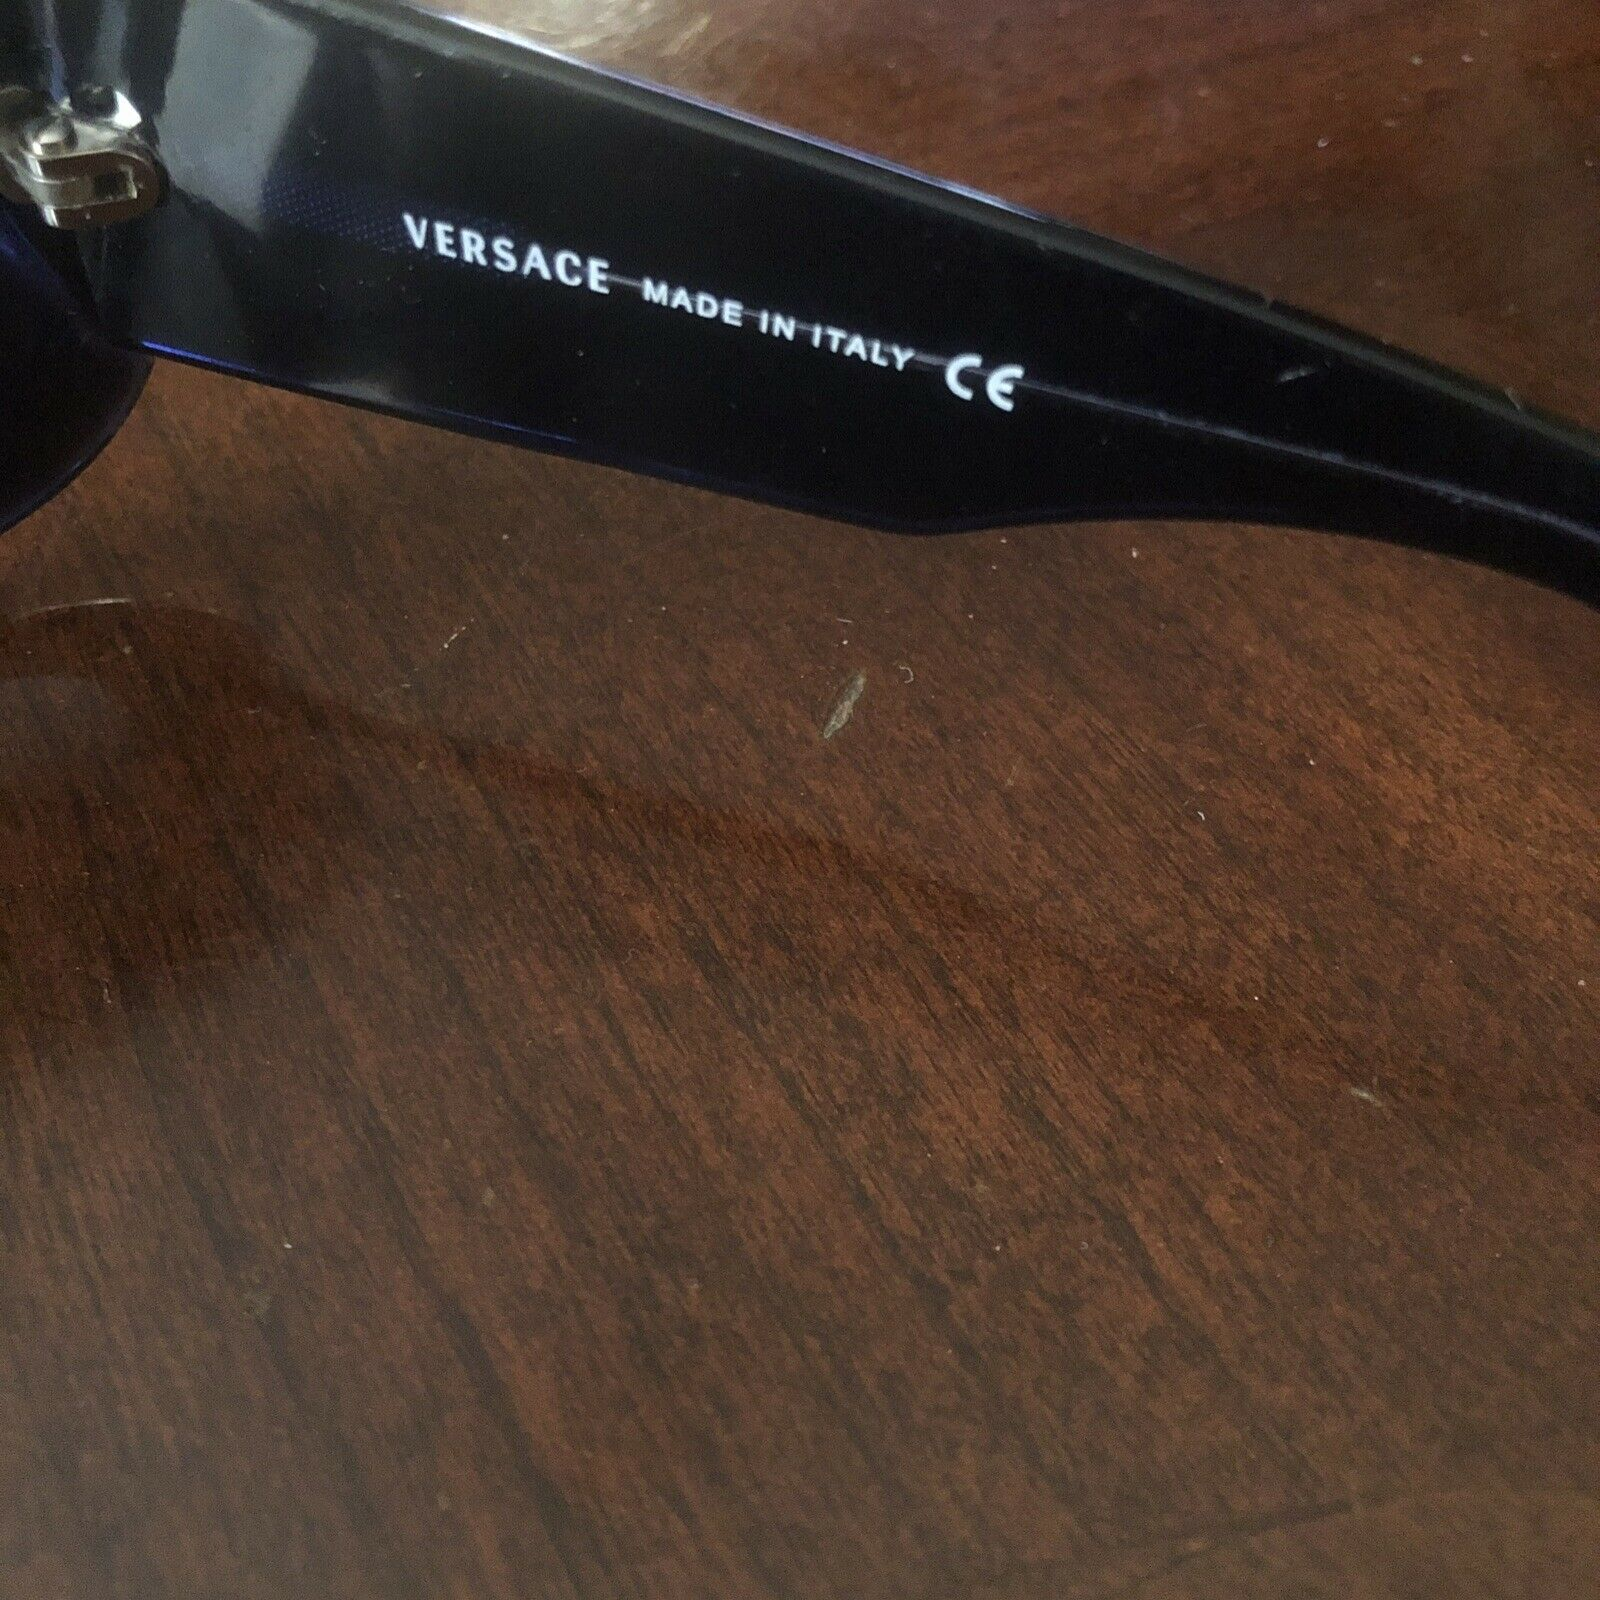 gianni versace sunglasses - image 6